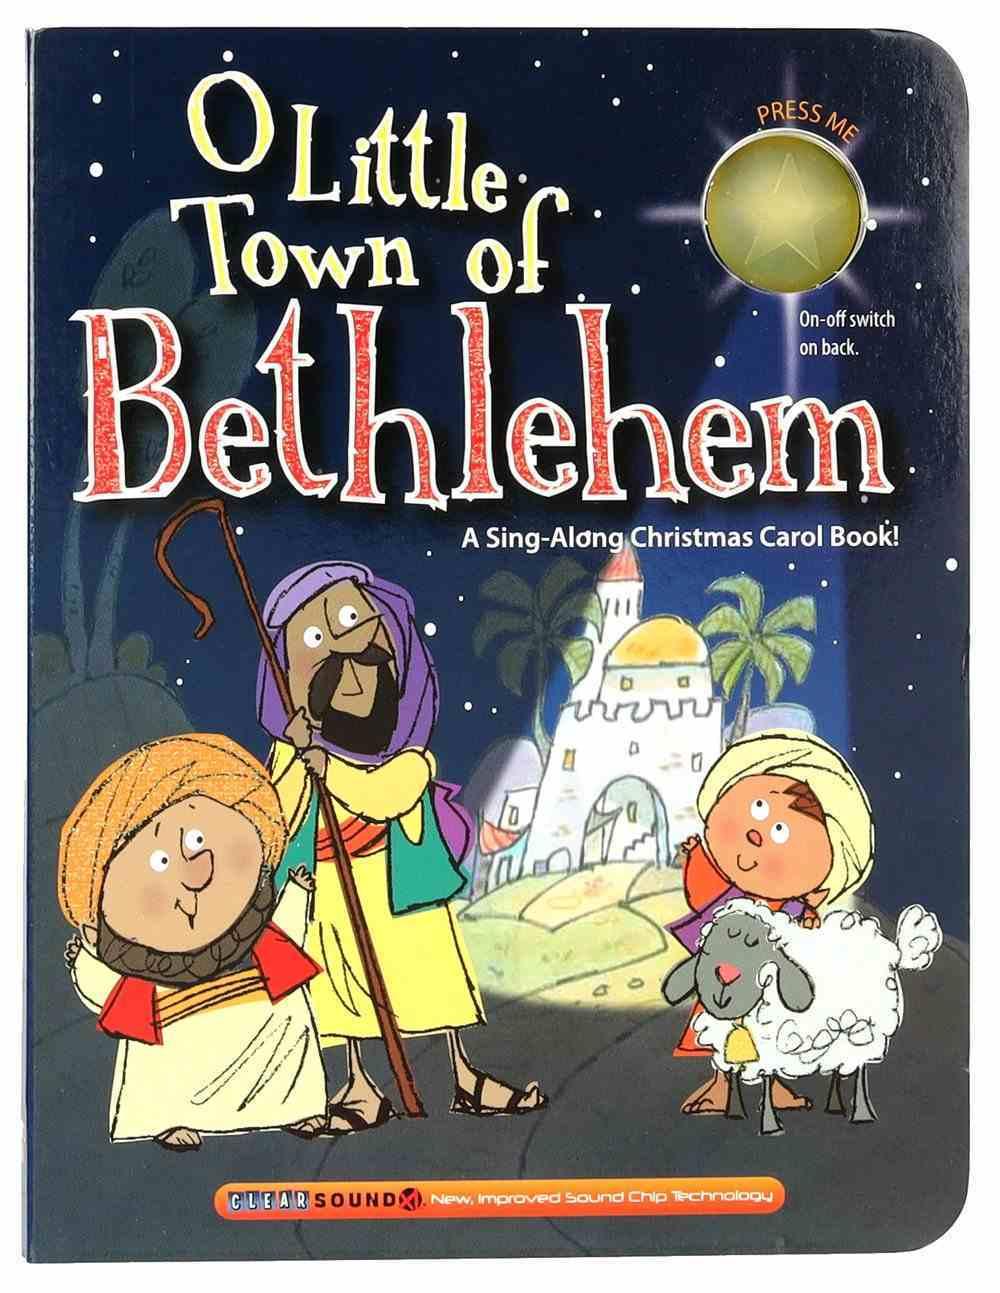 O Little Town of Bethlehem (A Christmas Carol Book Series) Board Book